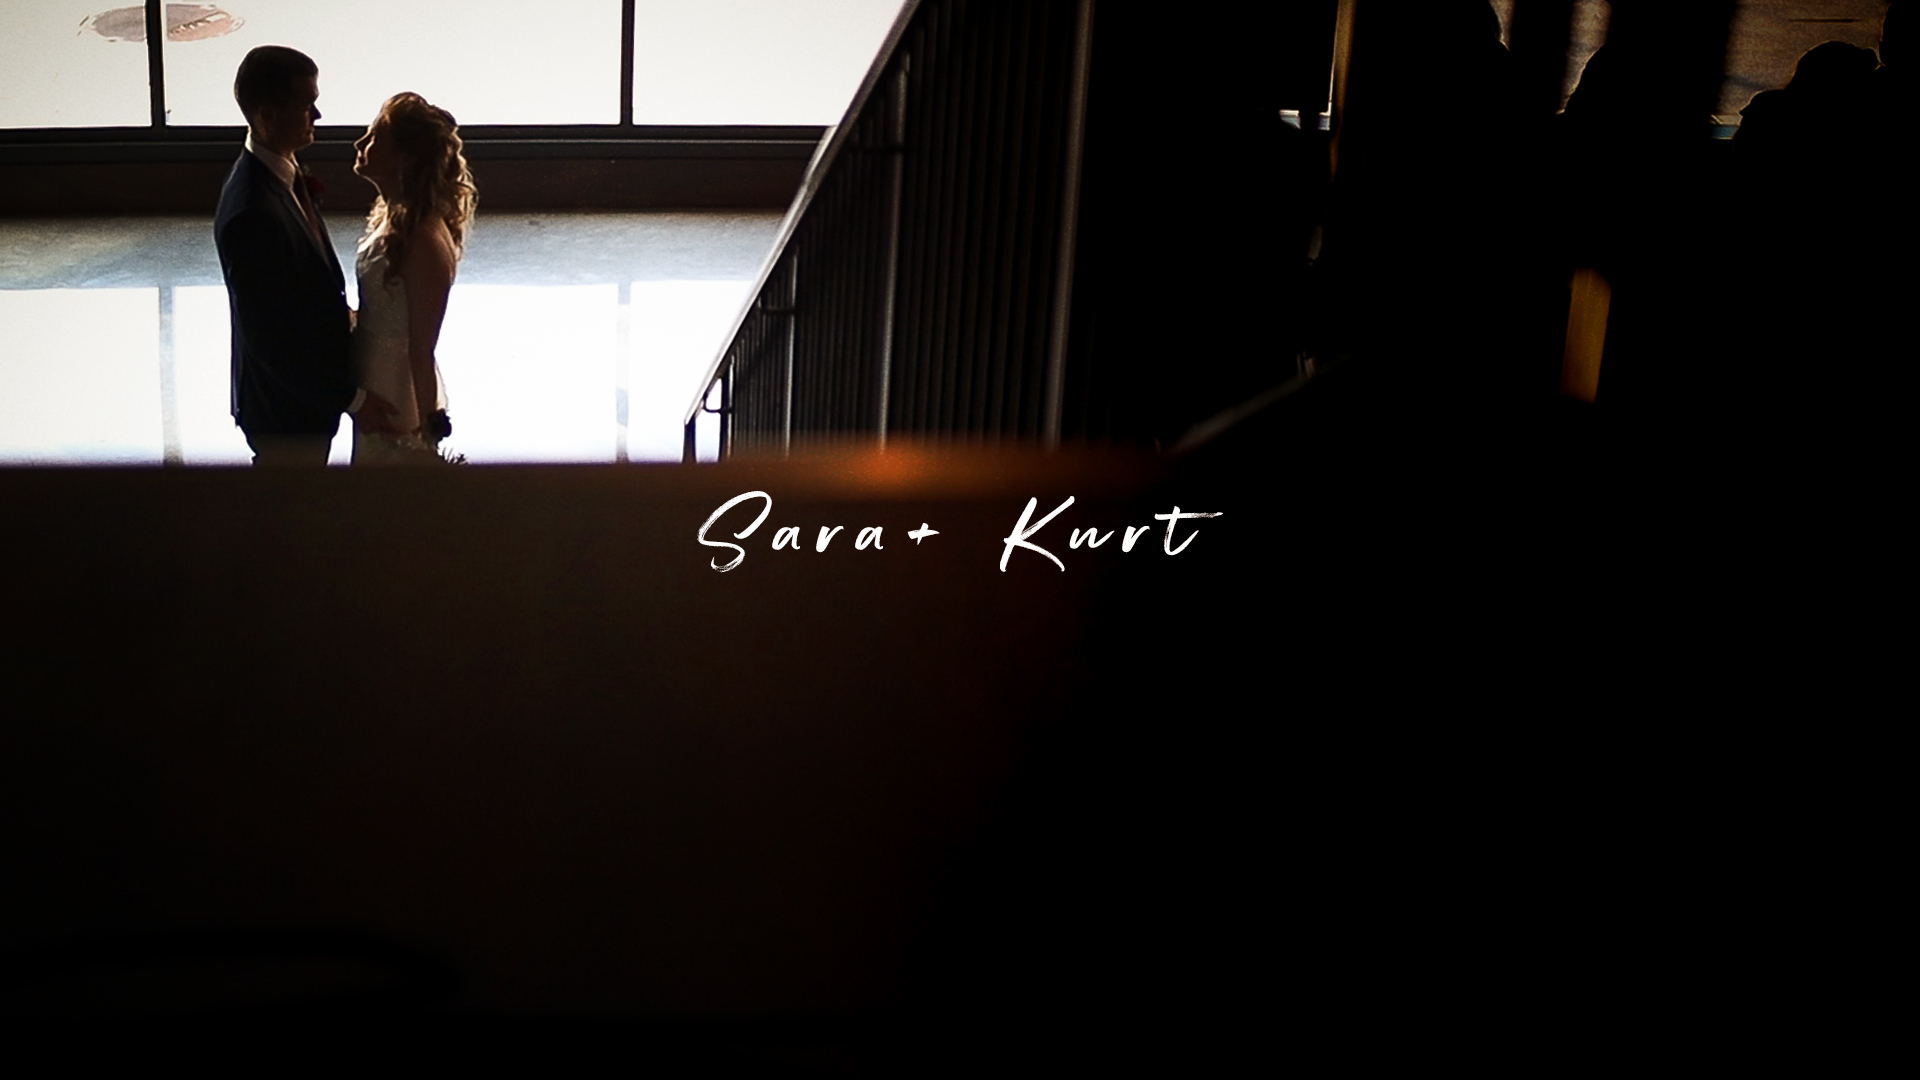 Sara + Kurt | Washington, District of Columbia | District Winery